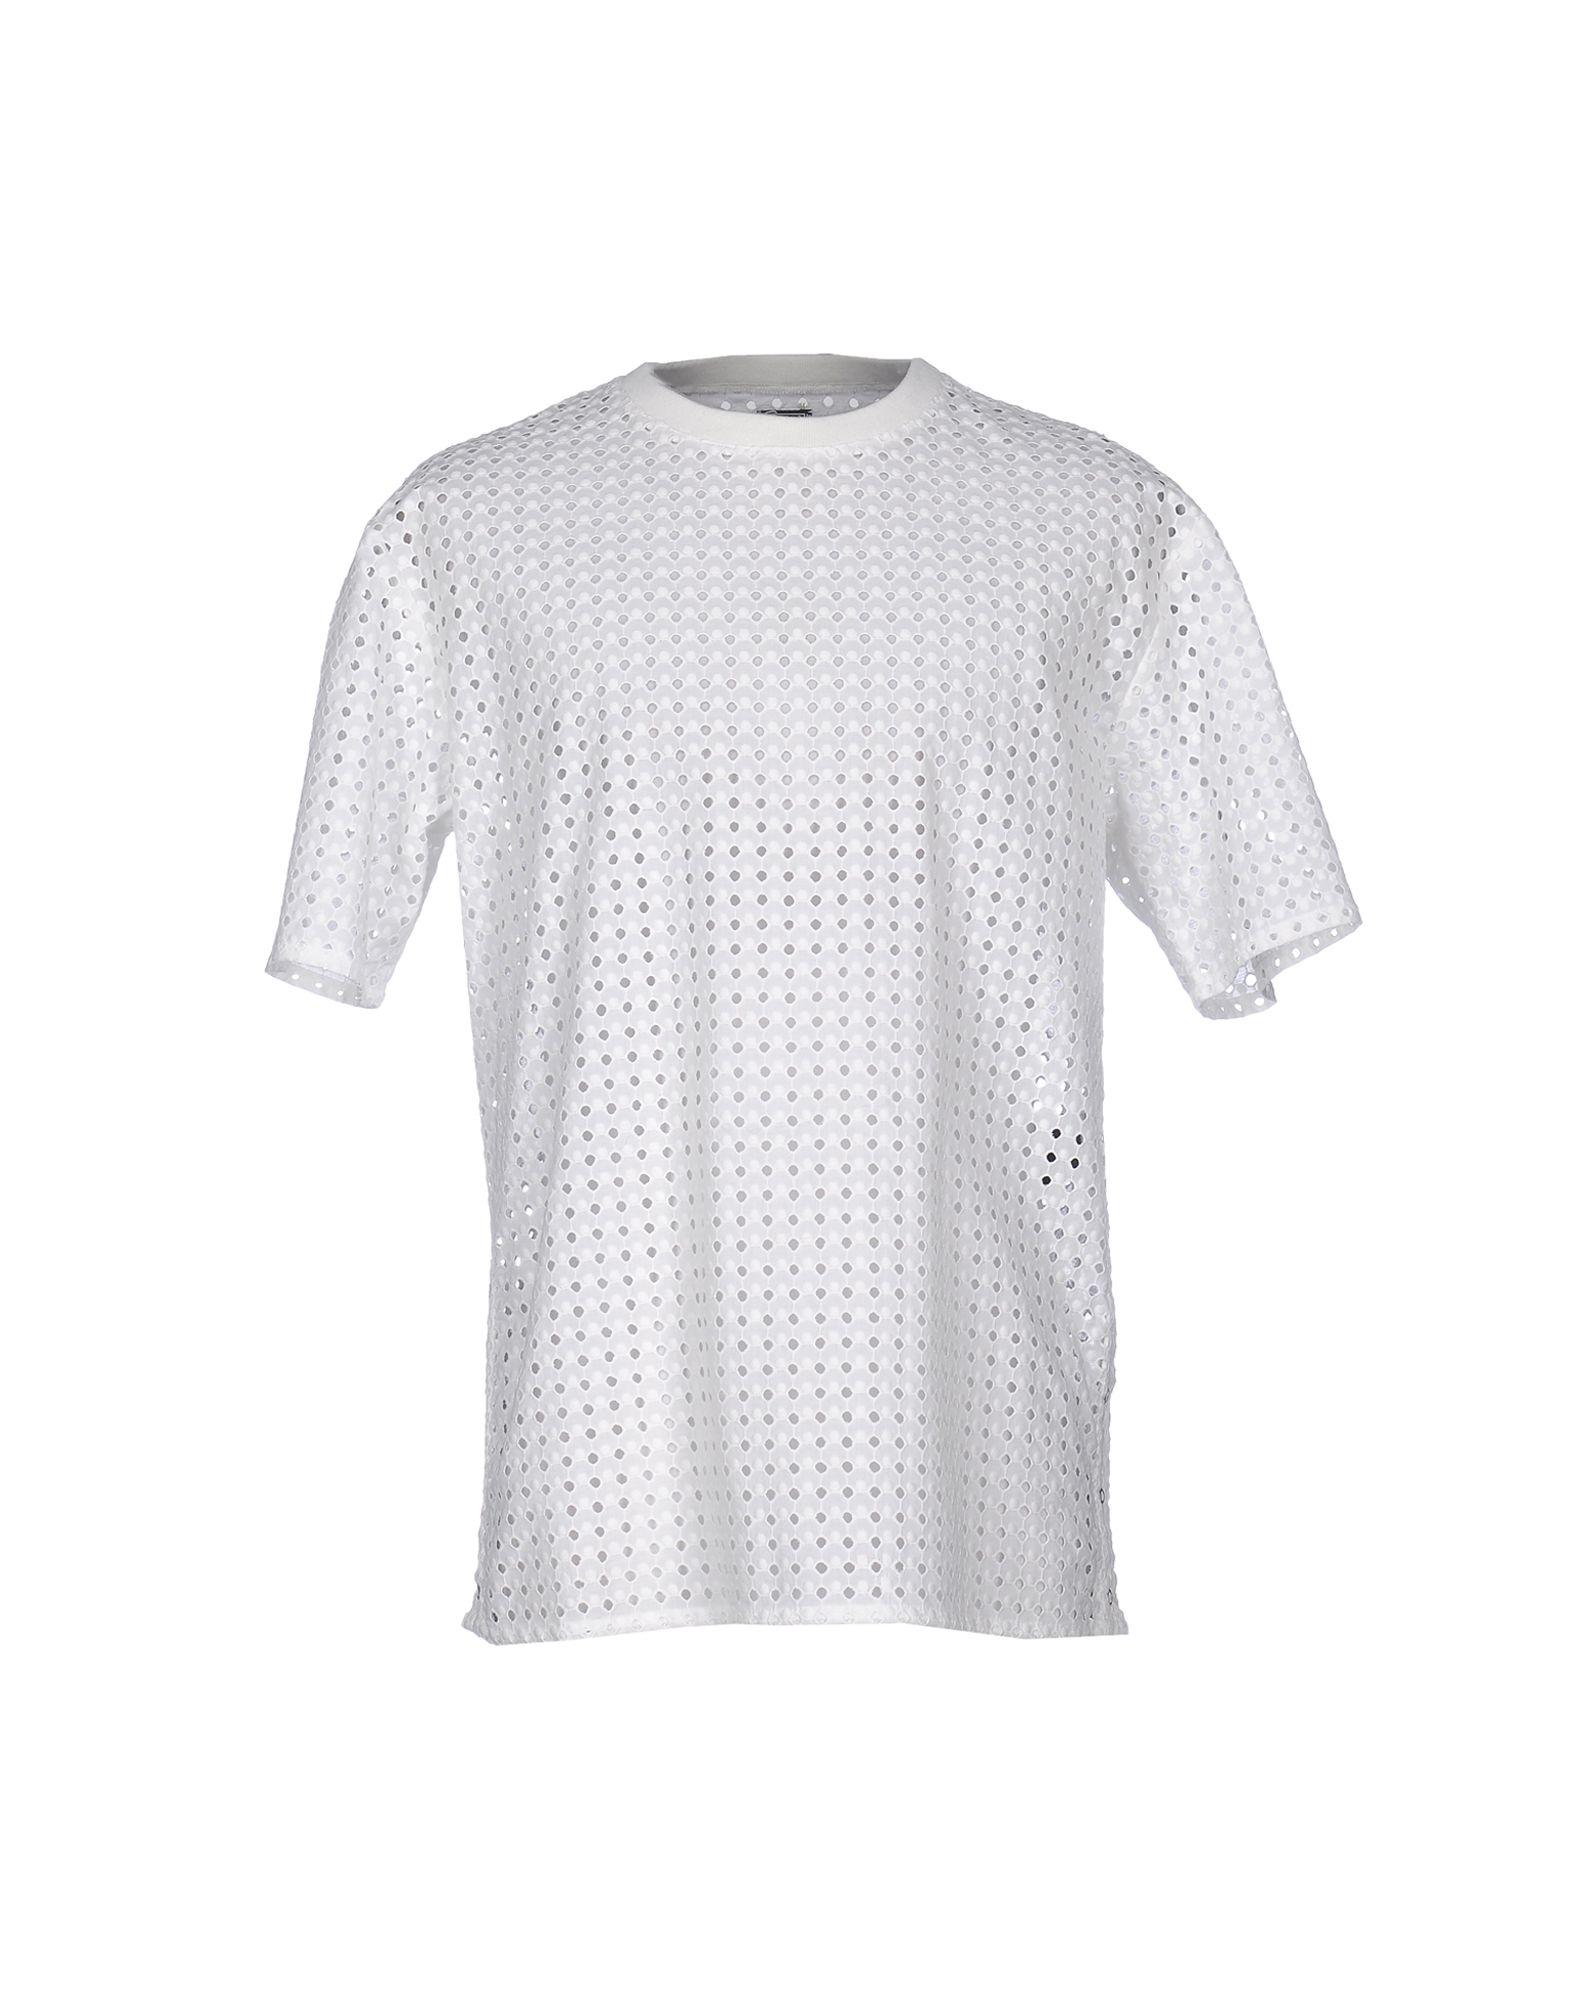 1205 Футболка 1205 футболка